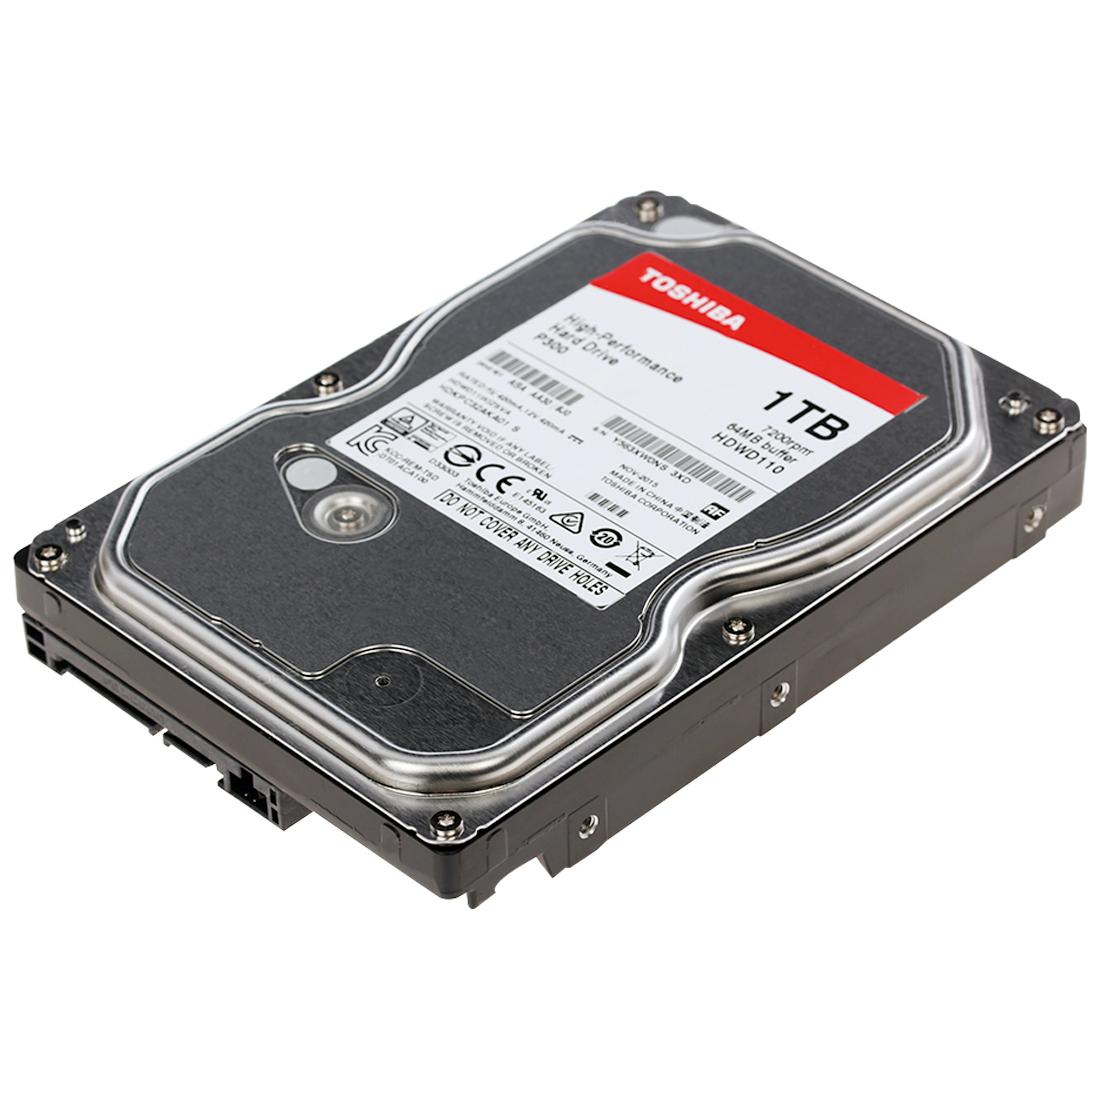 Жёсткий диск HDD 1Tb Toshiba P300 SATA6Gb / s 7200rpm 64Mb 3,5